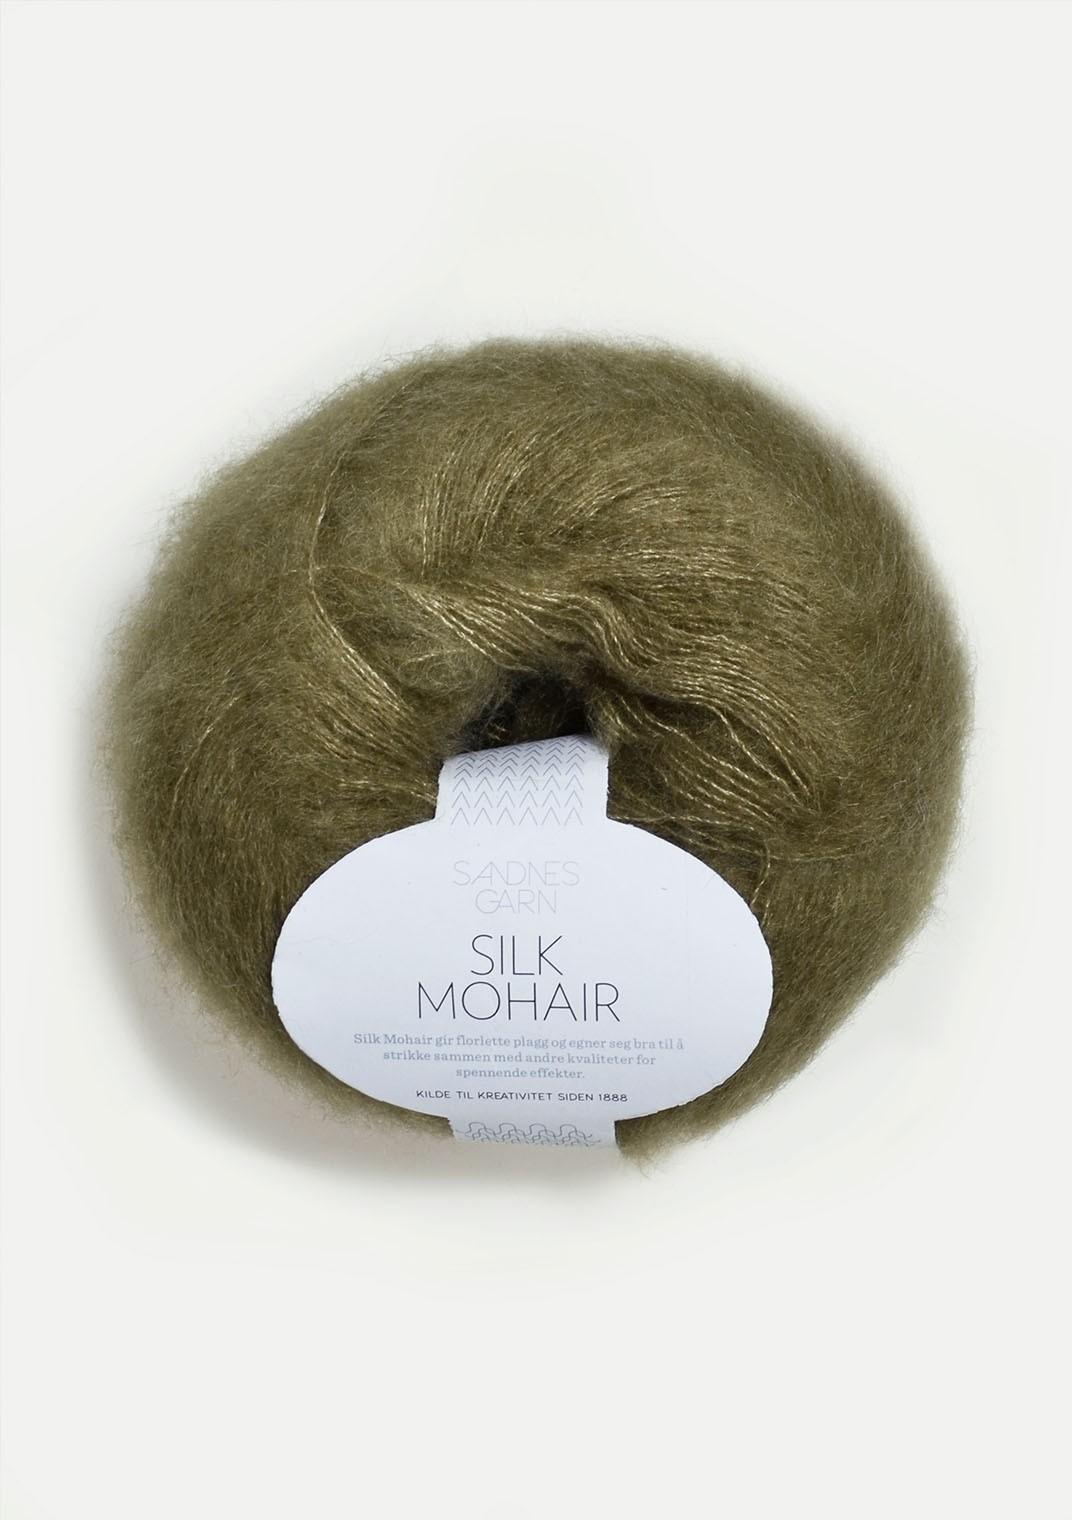 Silk Mohair, Sandnes Garn